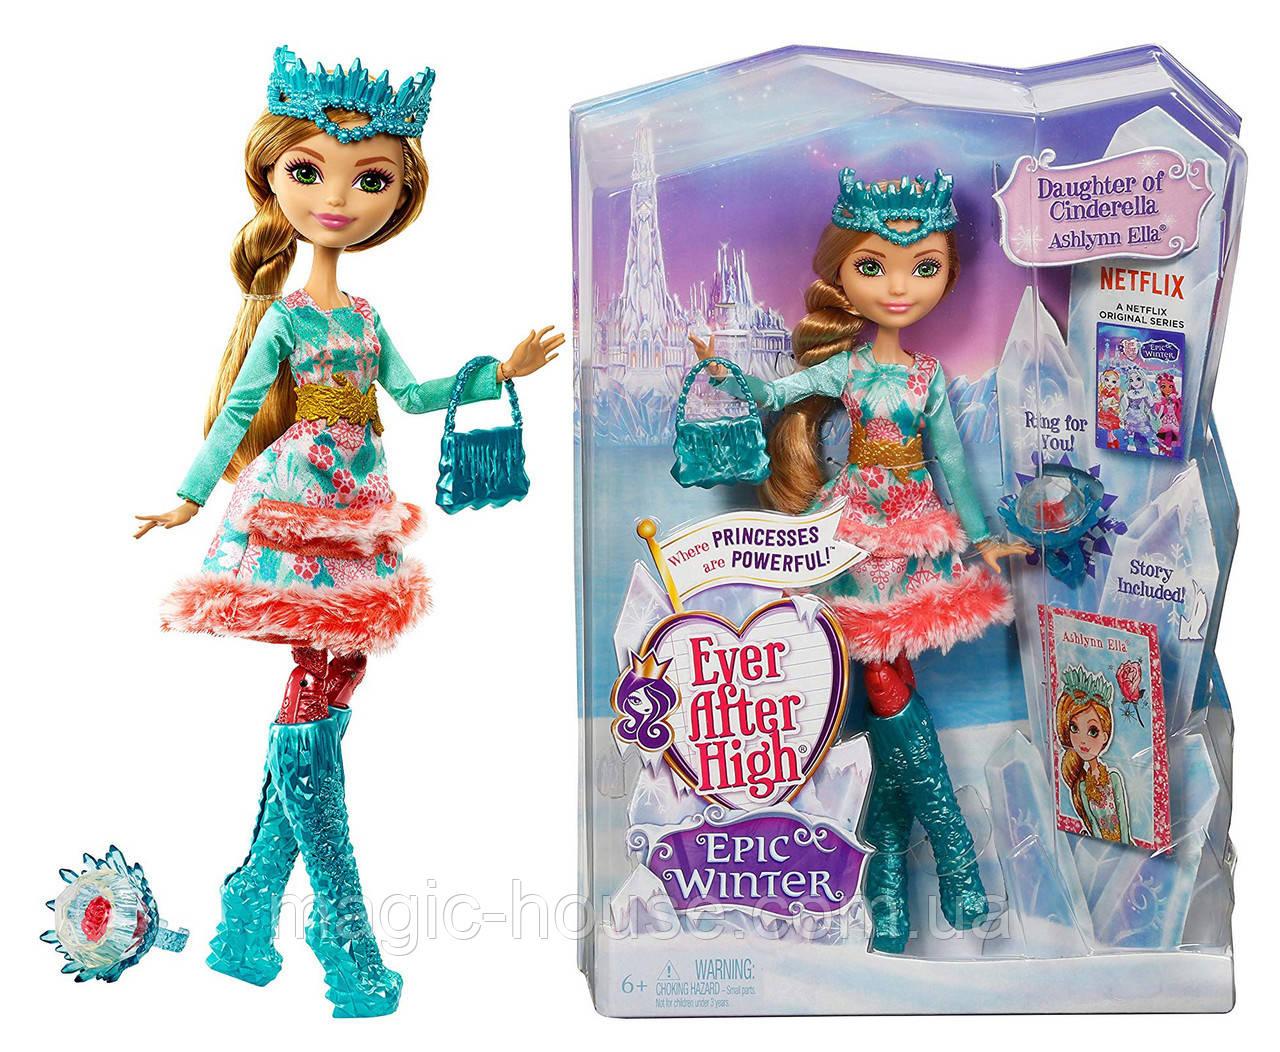 Ever After High Кукла Эшлин Элла Эпическая ЗимаEpic Winter Ashlynn Ella Doll ОРИГИНАЛ от Mattel